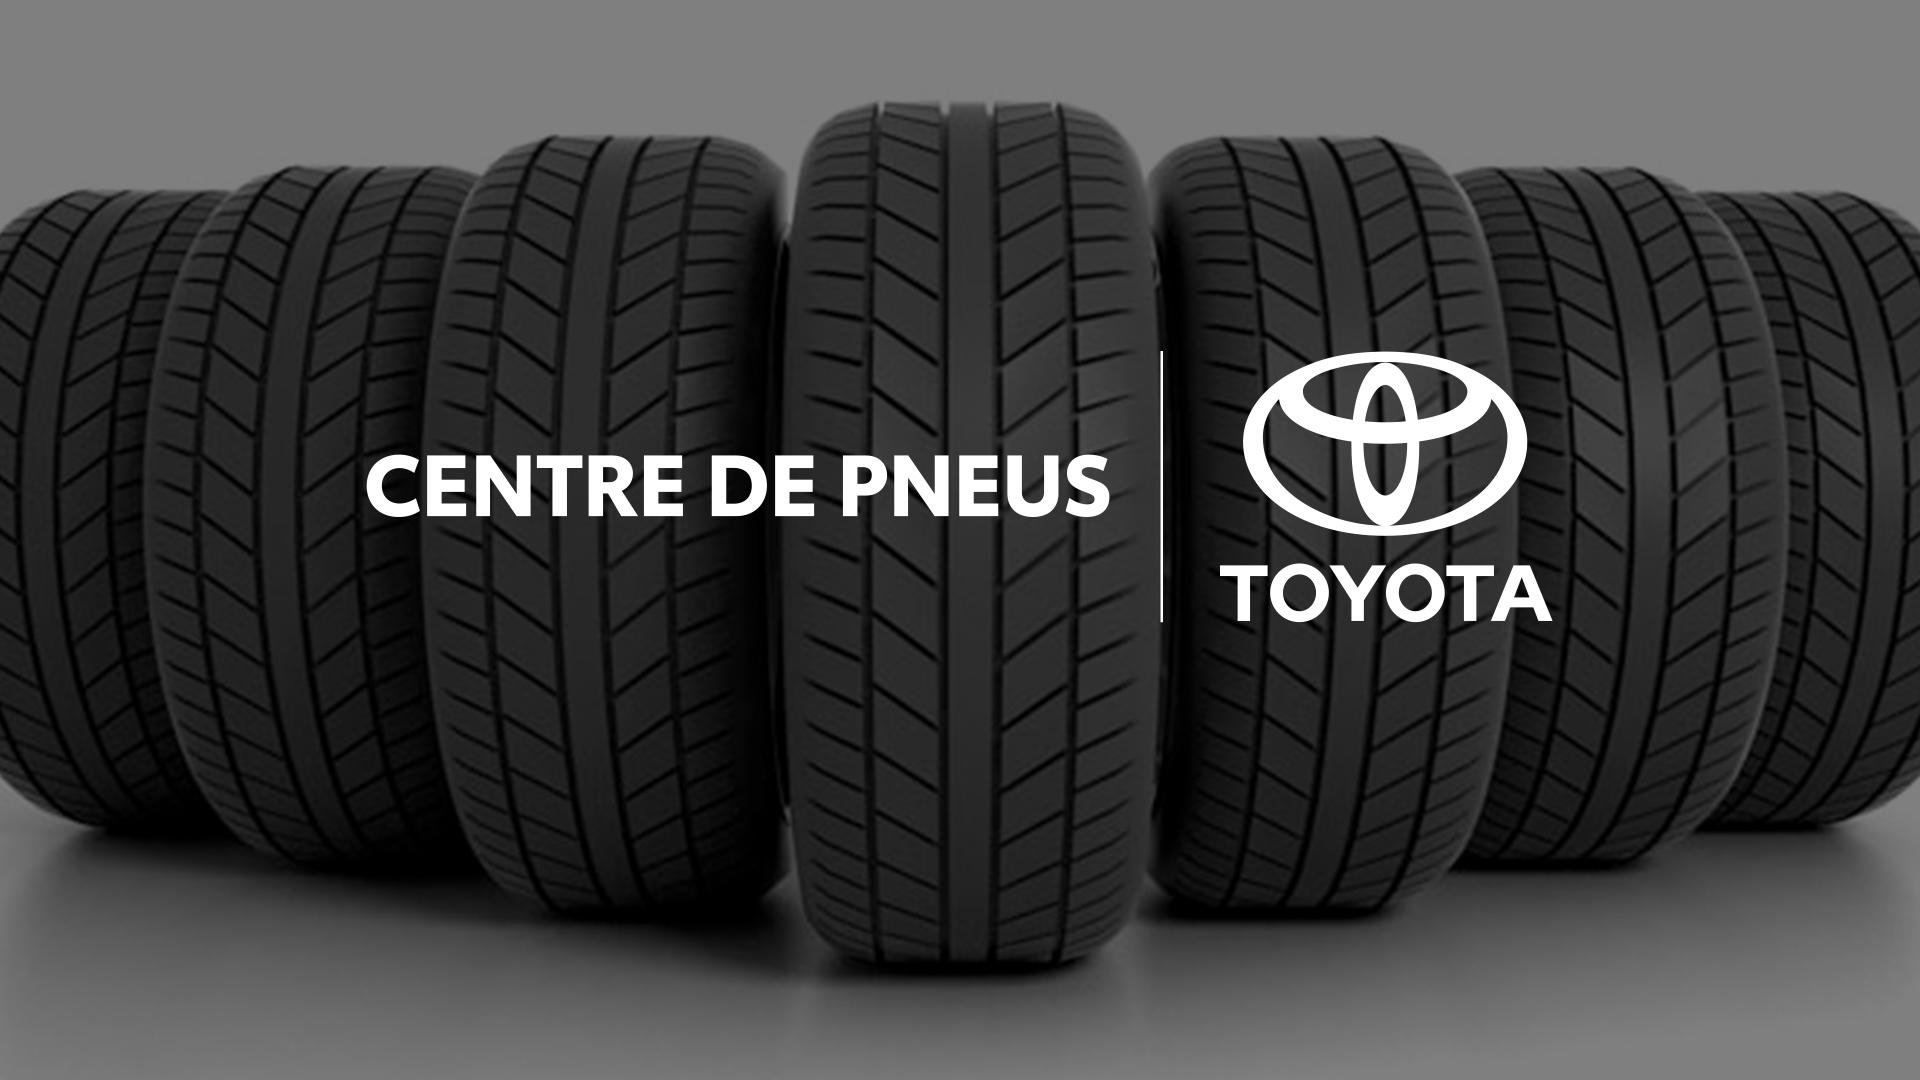 St-Hubert Toyota Centre de pneus